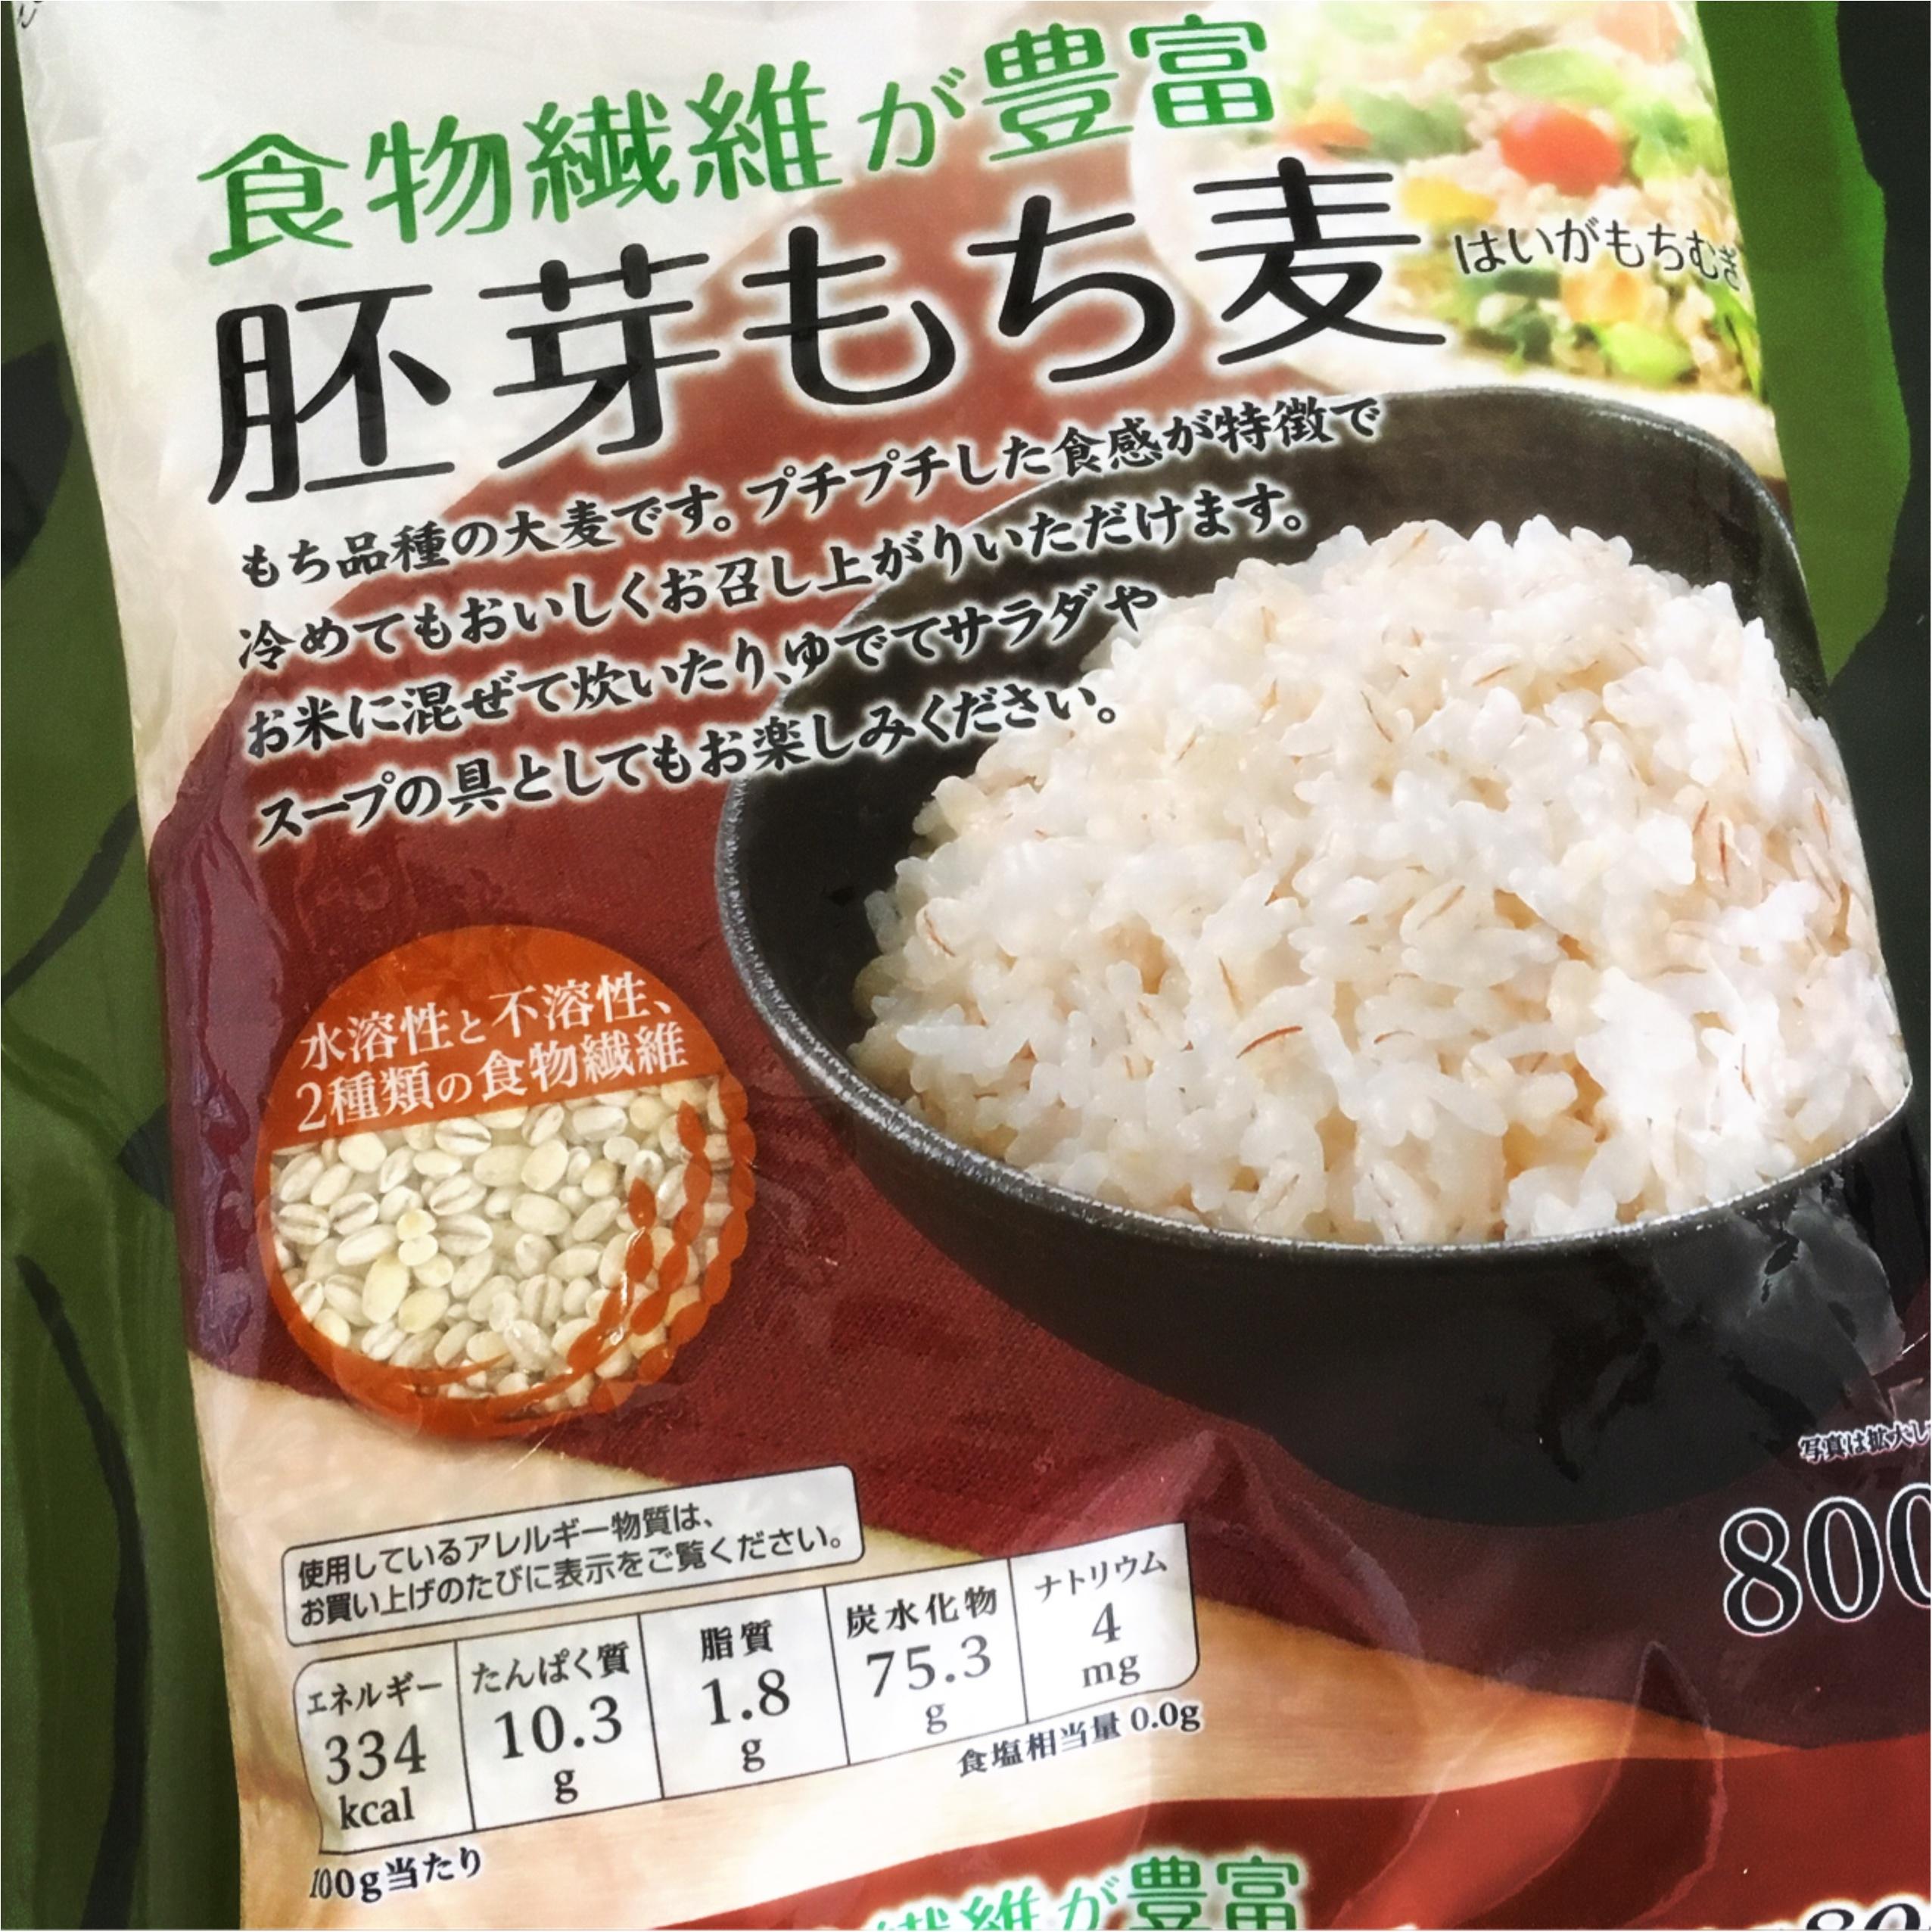 【COOKING】いま注目されているもち麦でヘルシーな食事♫_1